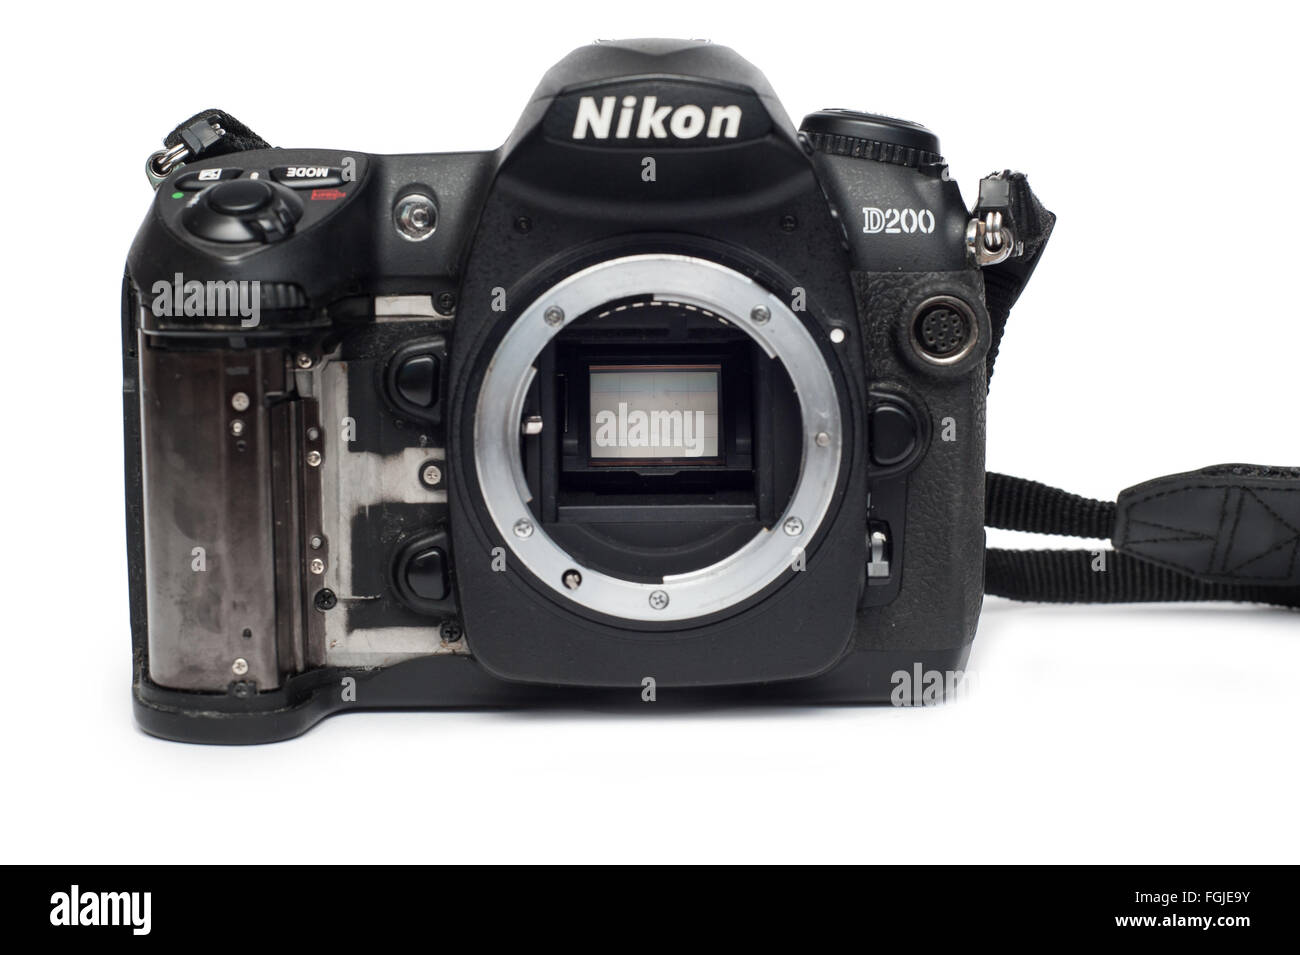 Pavlograd, Donetsk - Januart 27, 2015: Nikon D200 DSLR  Camera with loose rubber. closeup mirror inside. Isolated - Stock Image